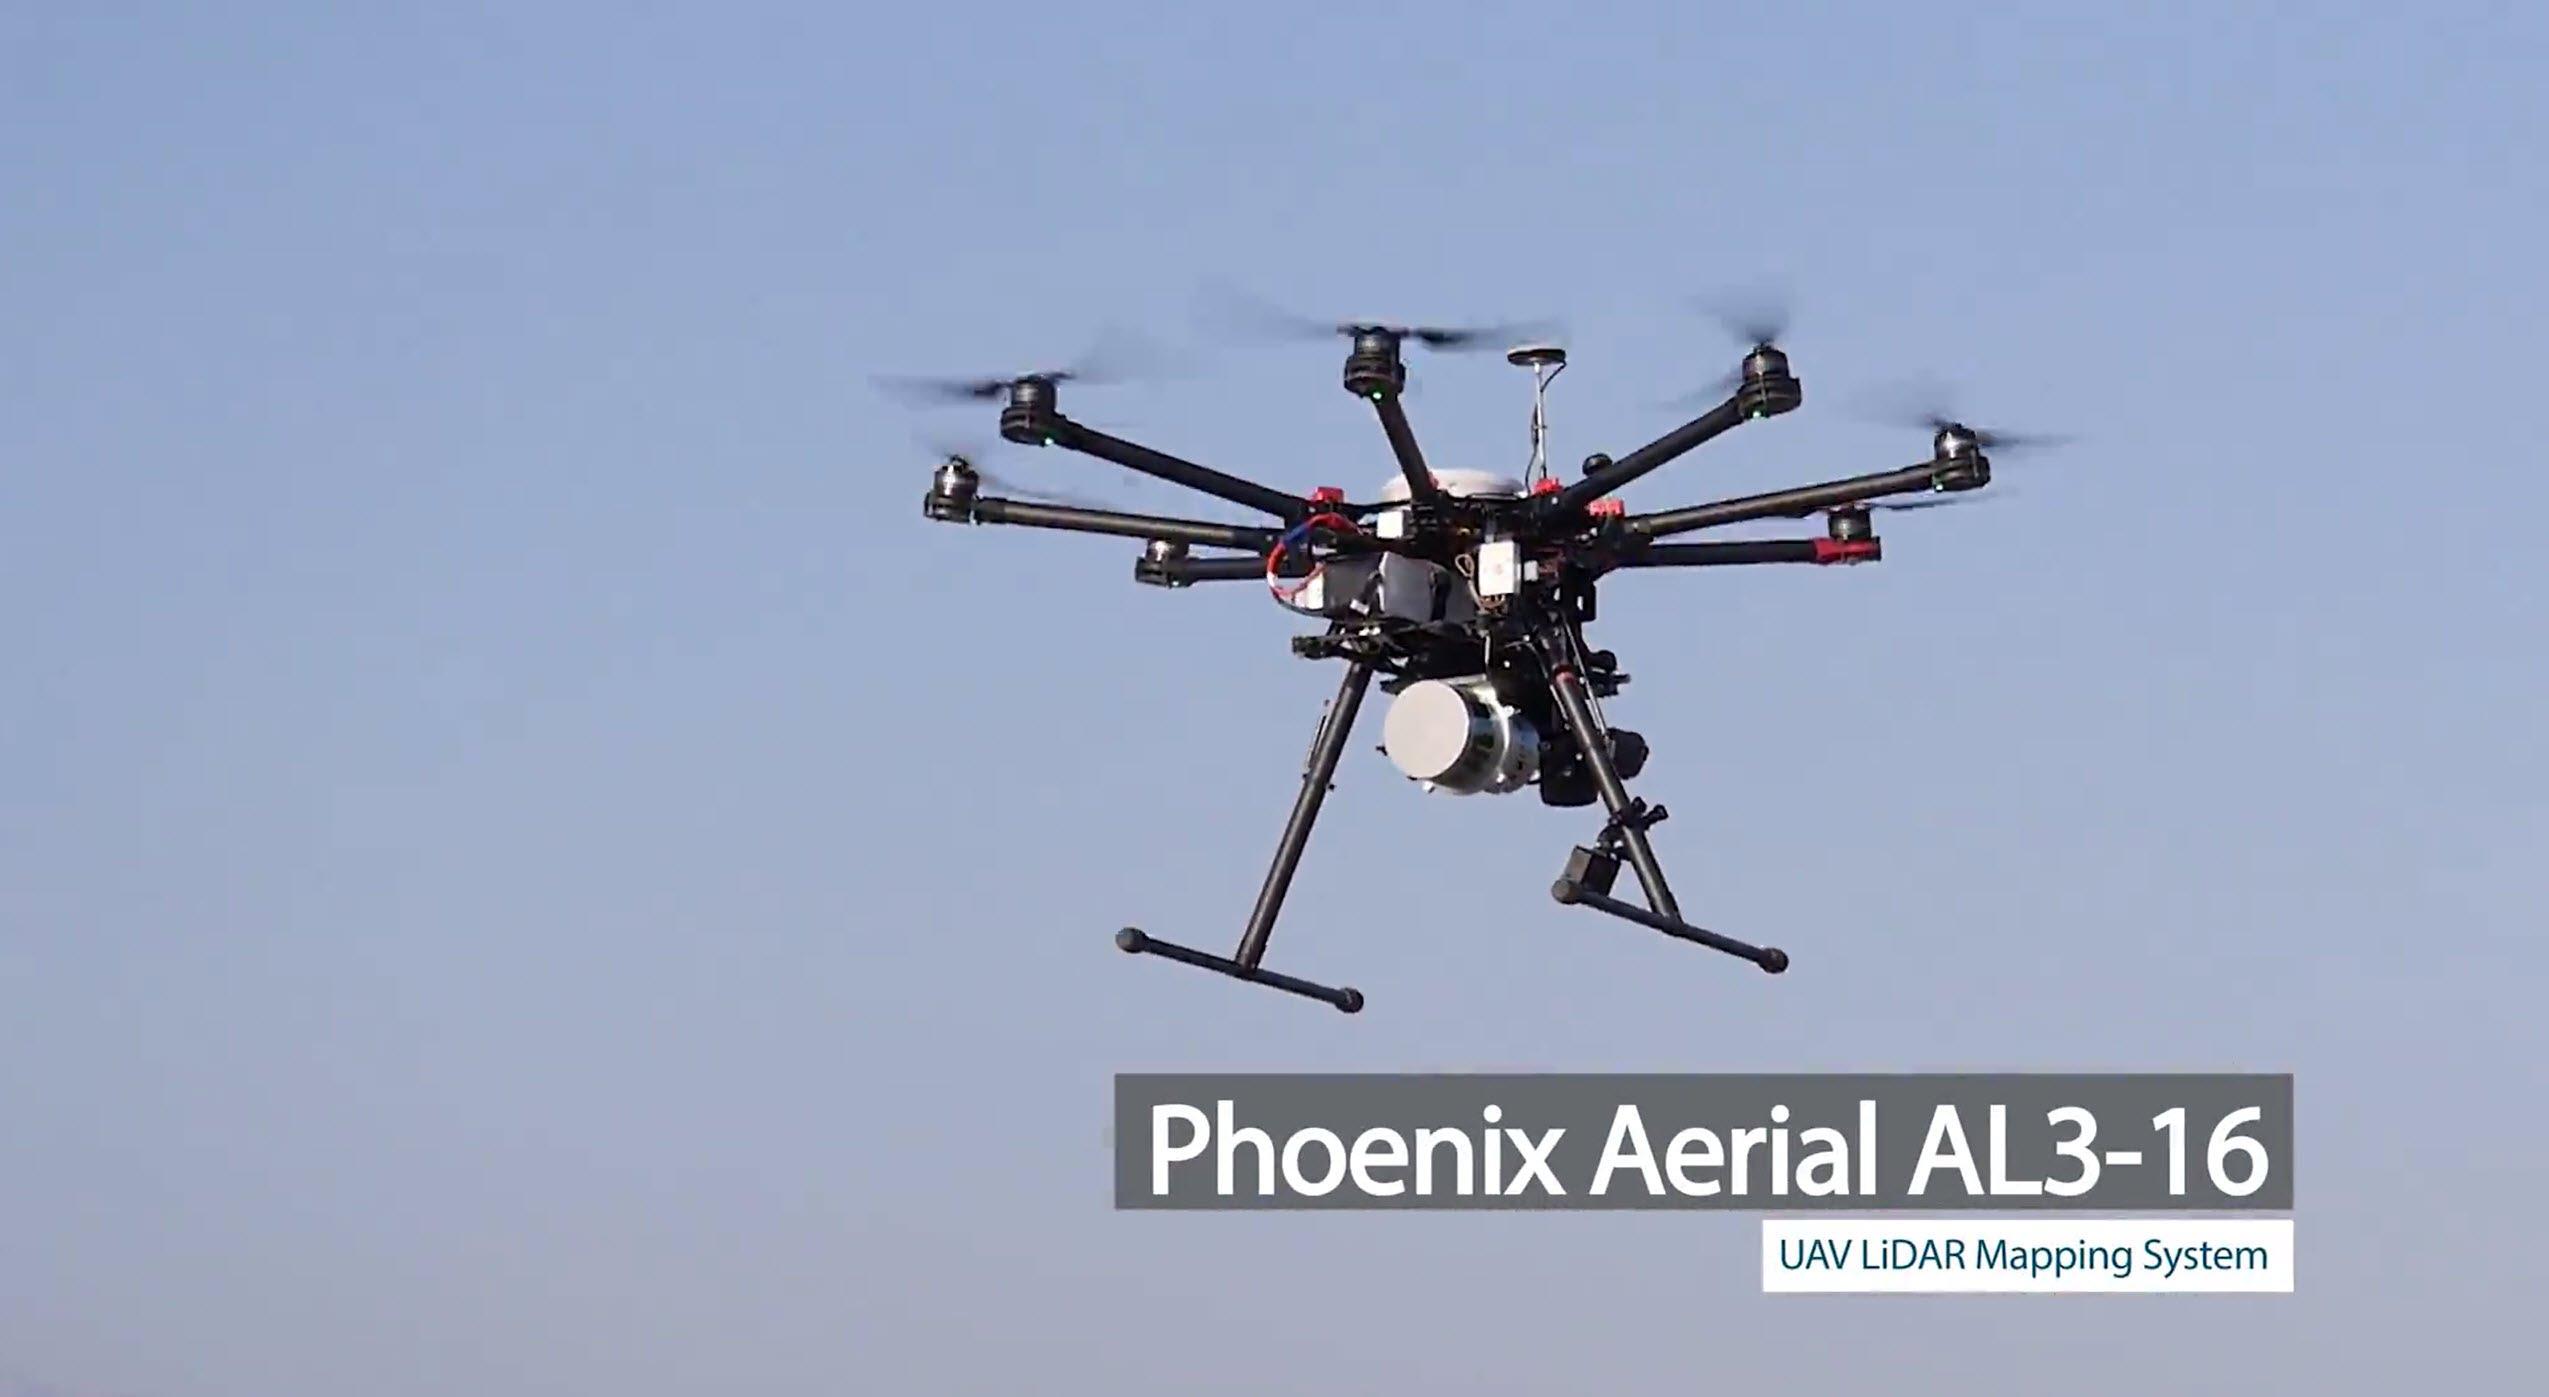 Phoenix Aerial AL3-16